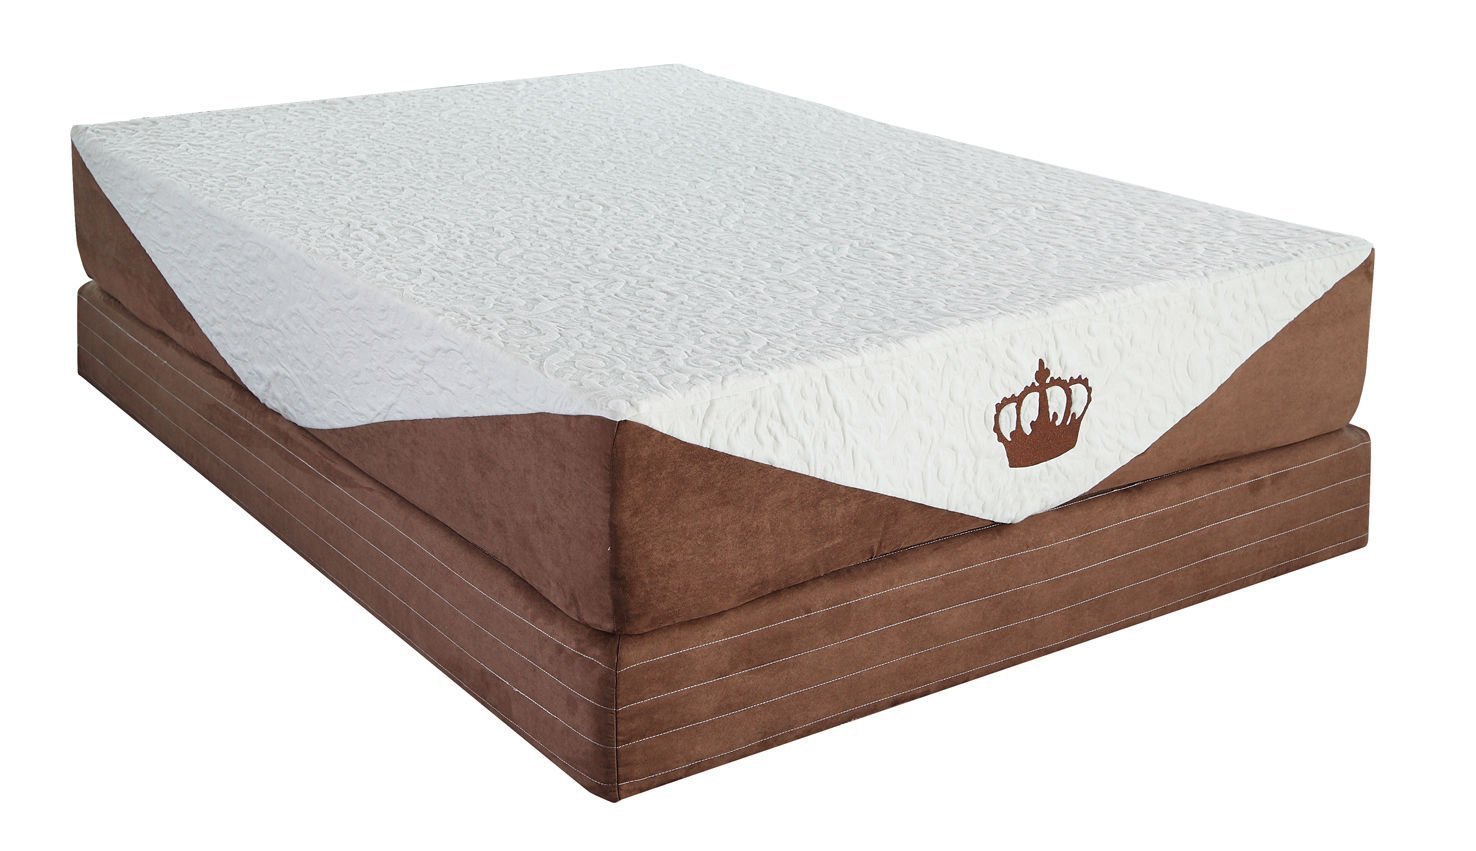 10 Quot King Coolbreeze Gel Memory Foam Mattress